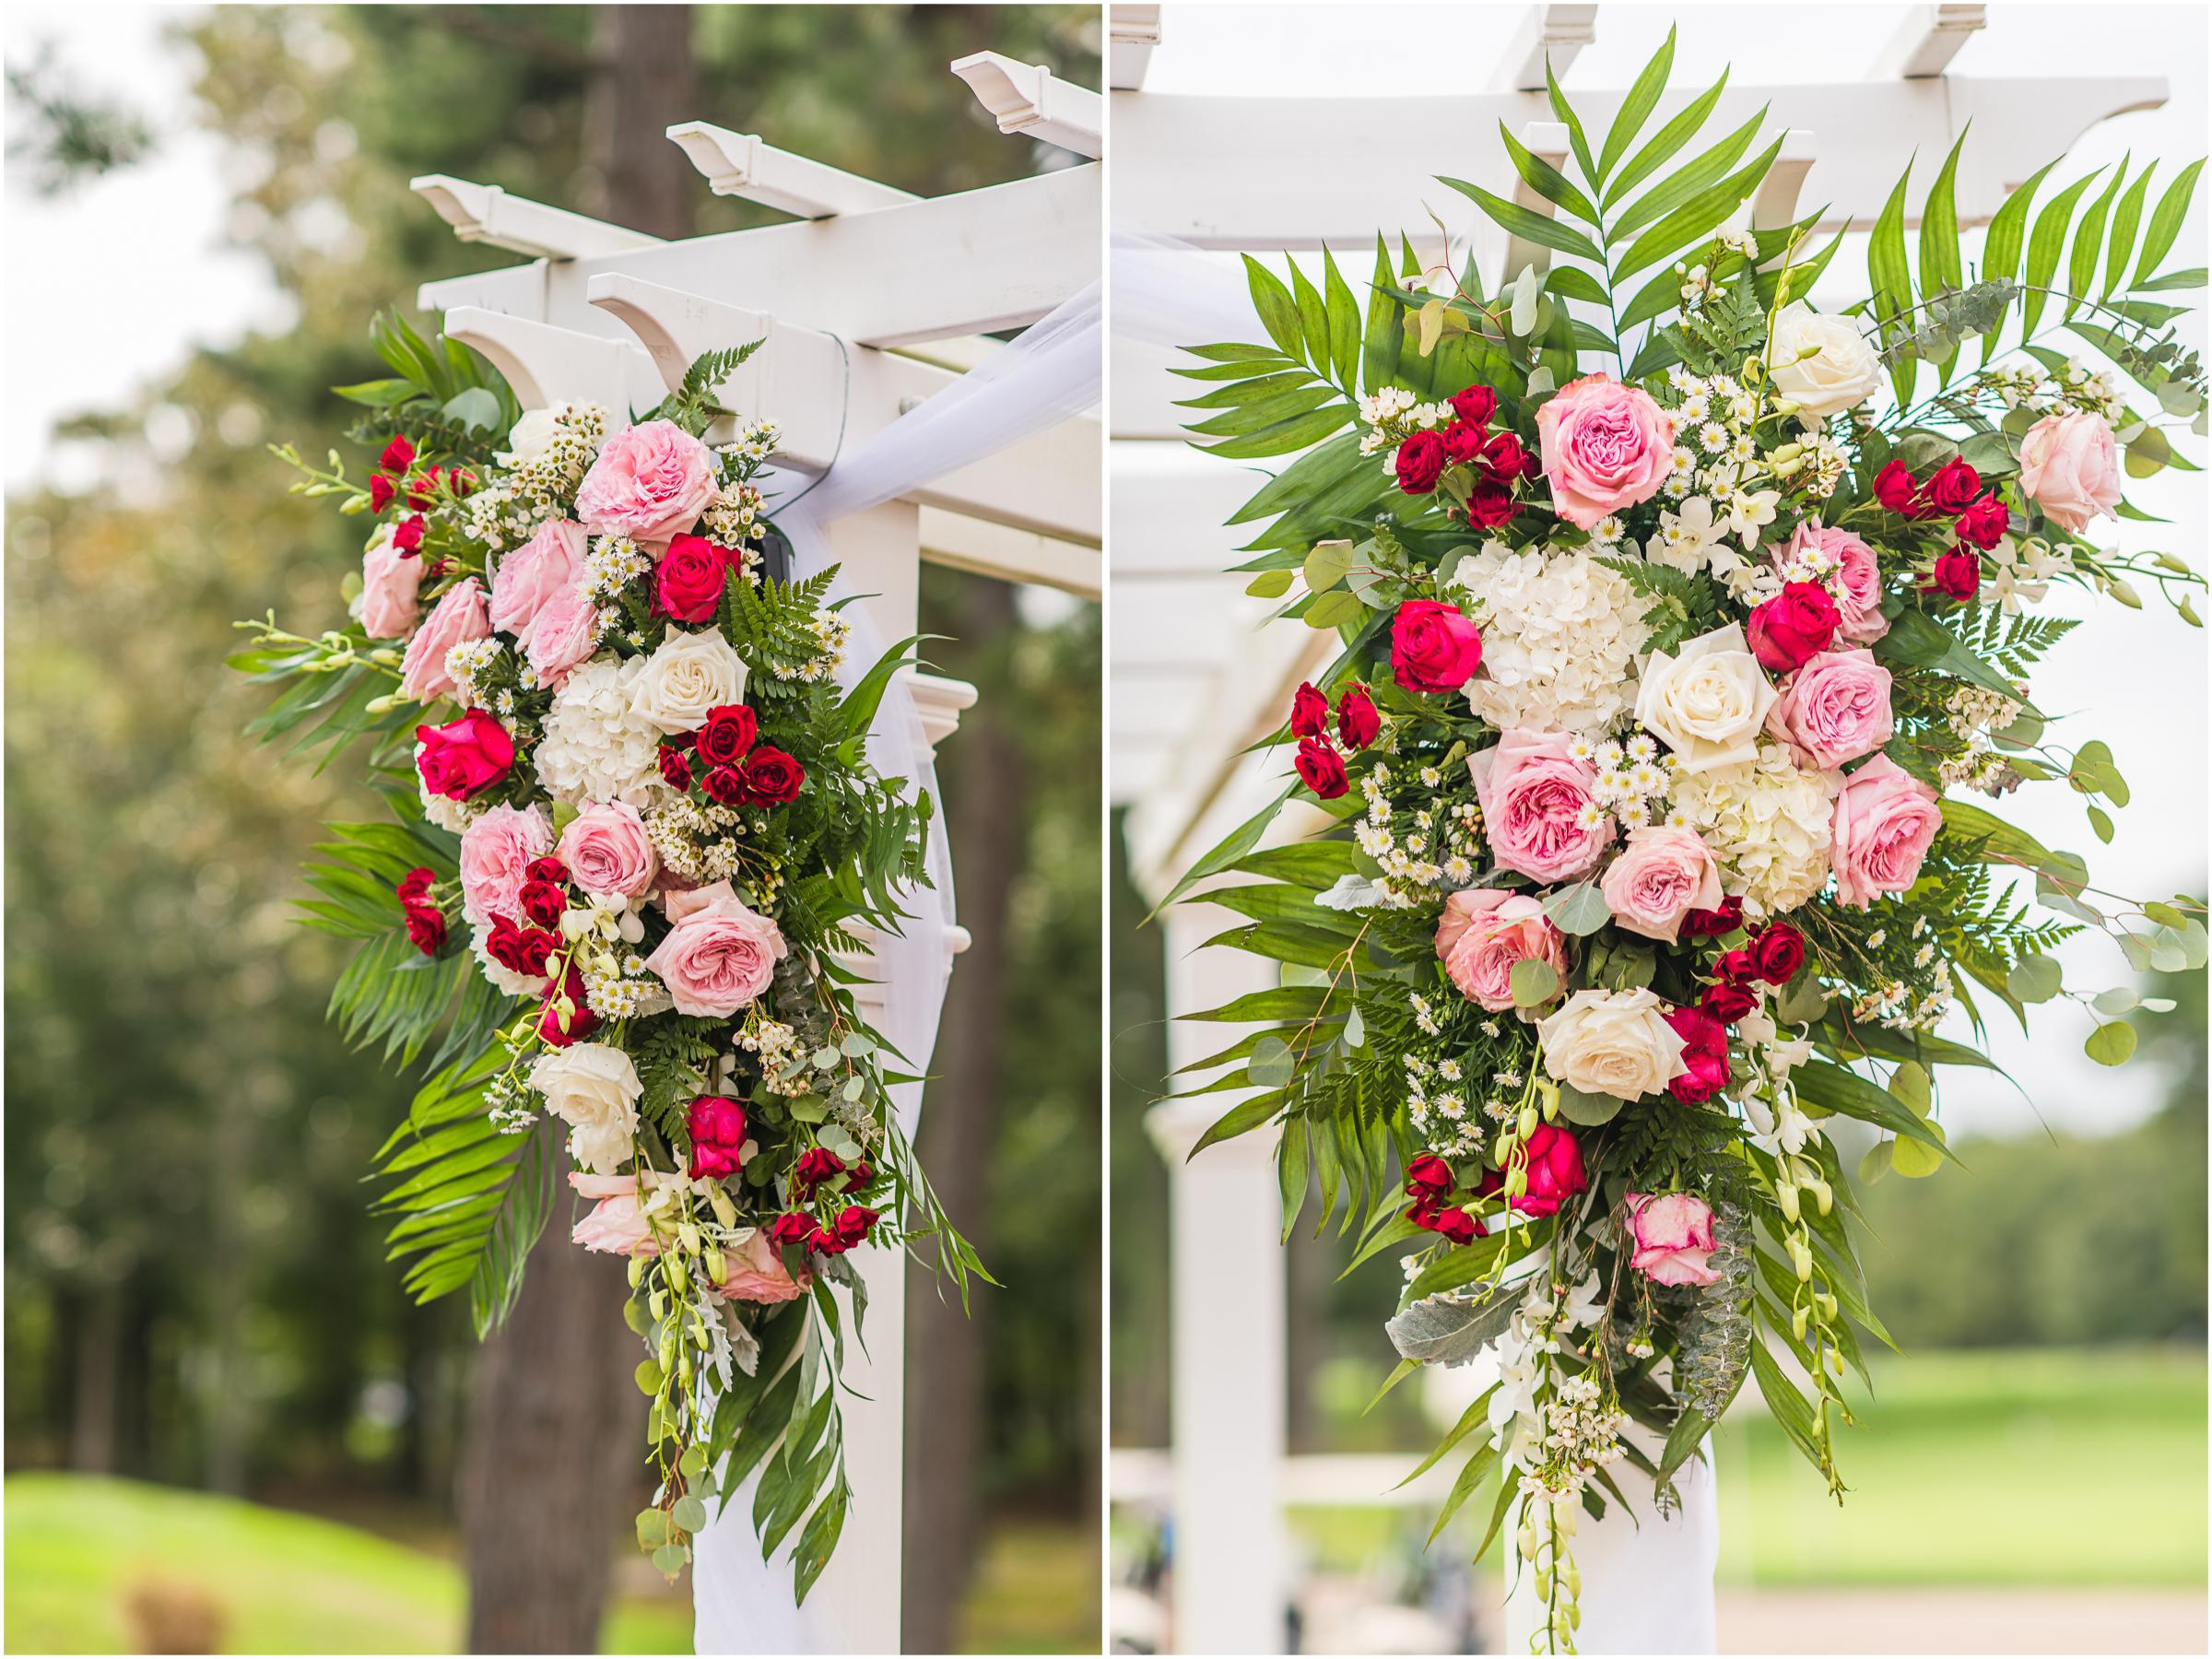 nj-wedding-photographer-blue-heron-pine-wedding-delsa-32.jpg